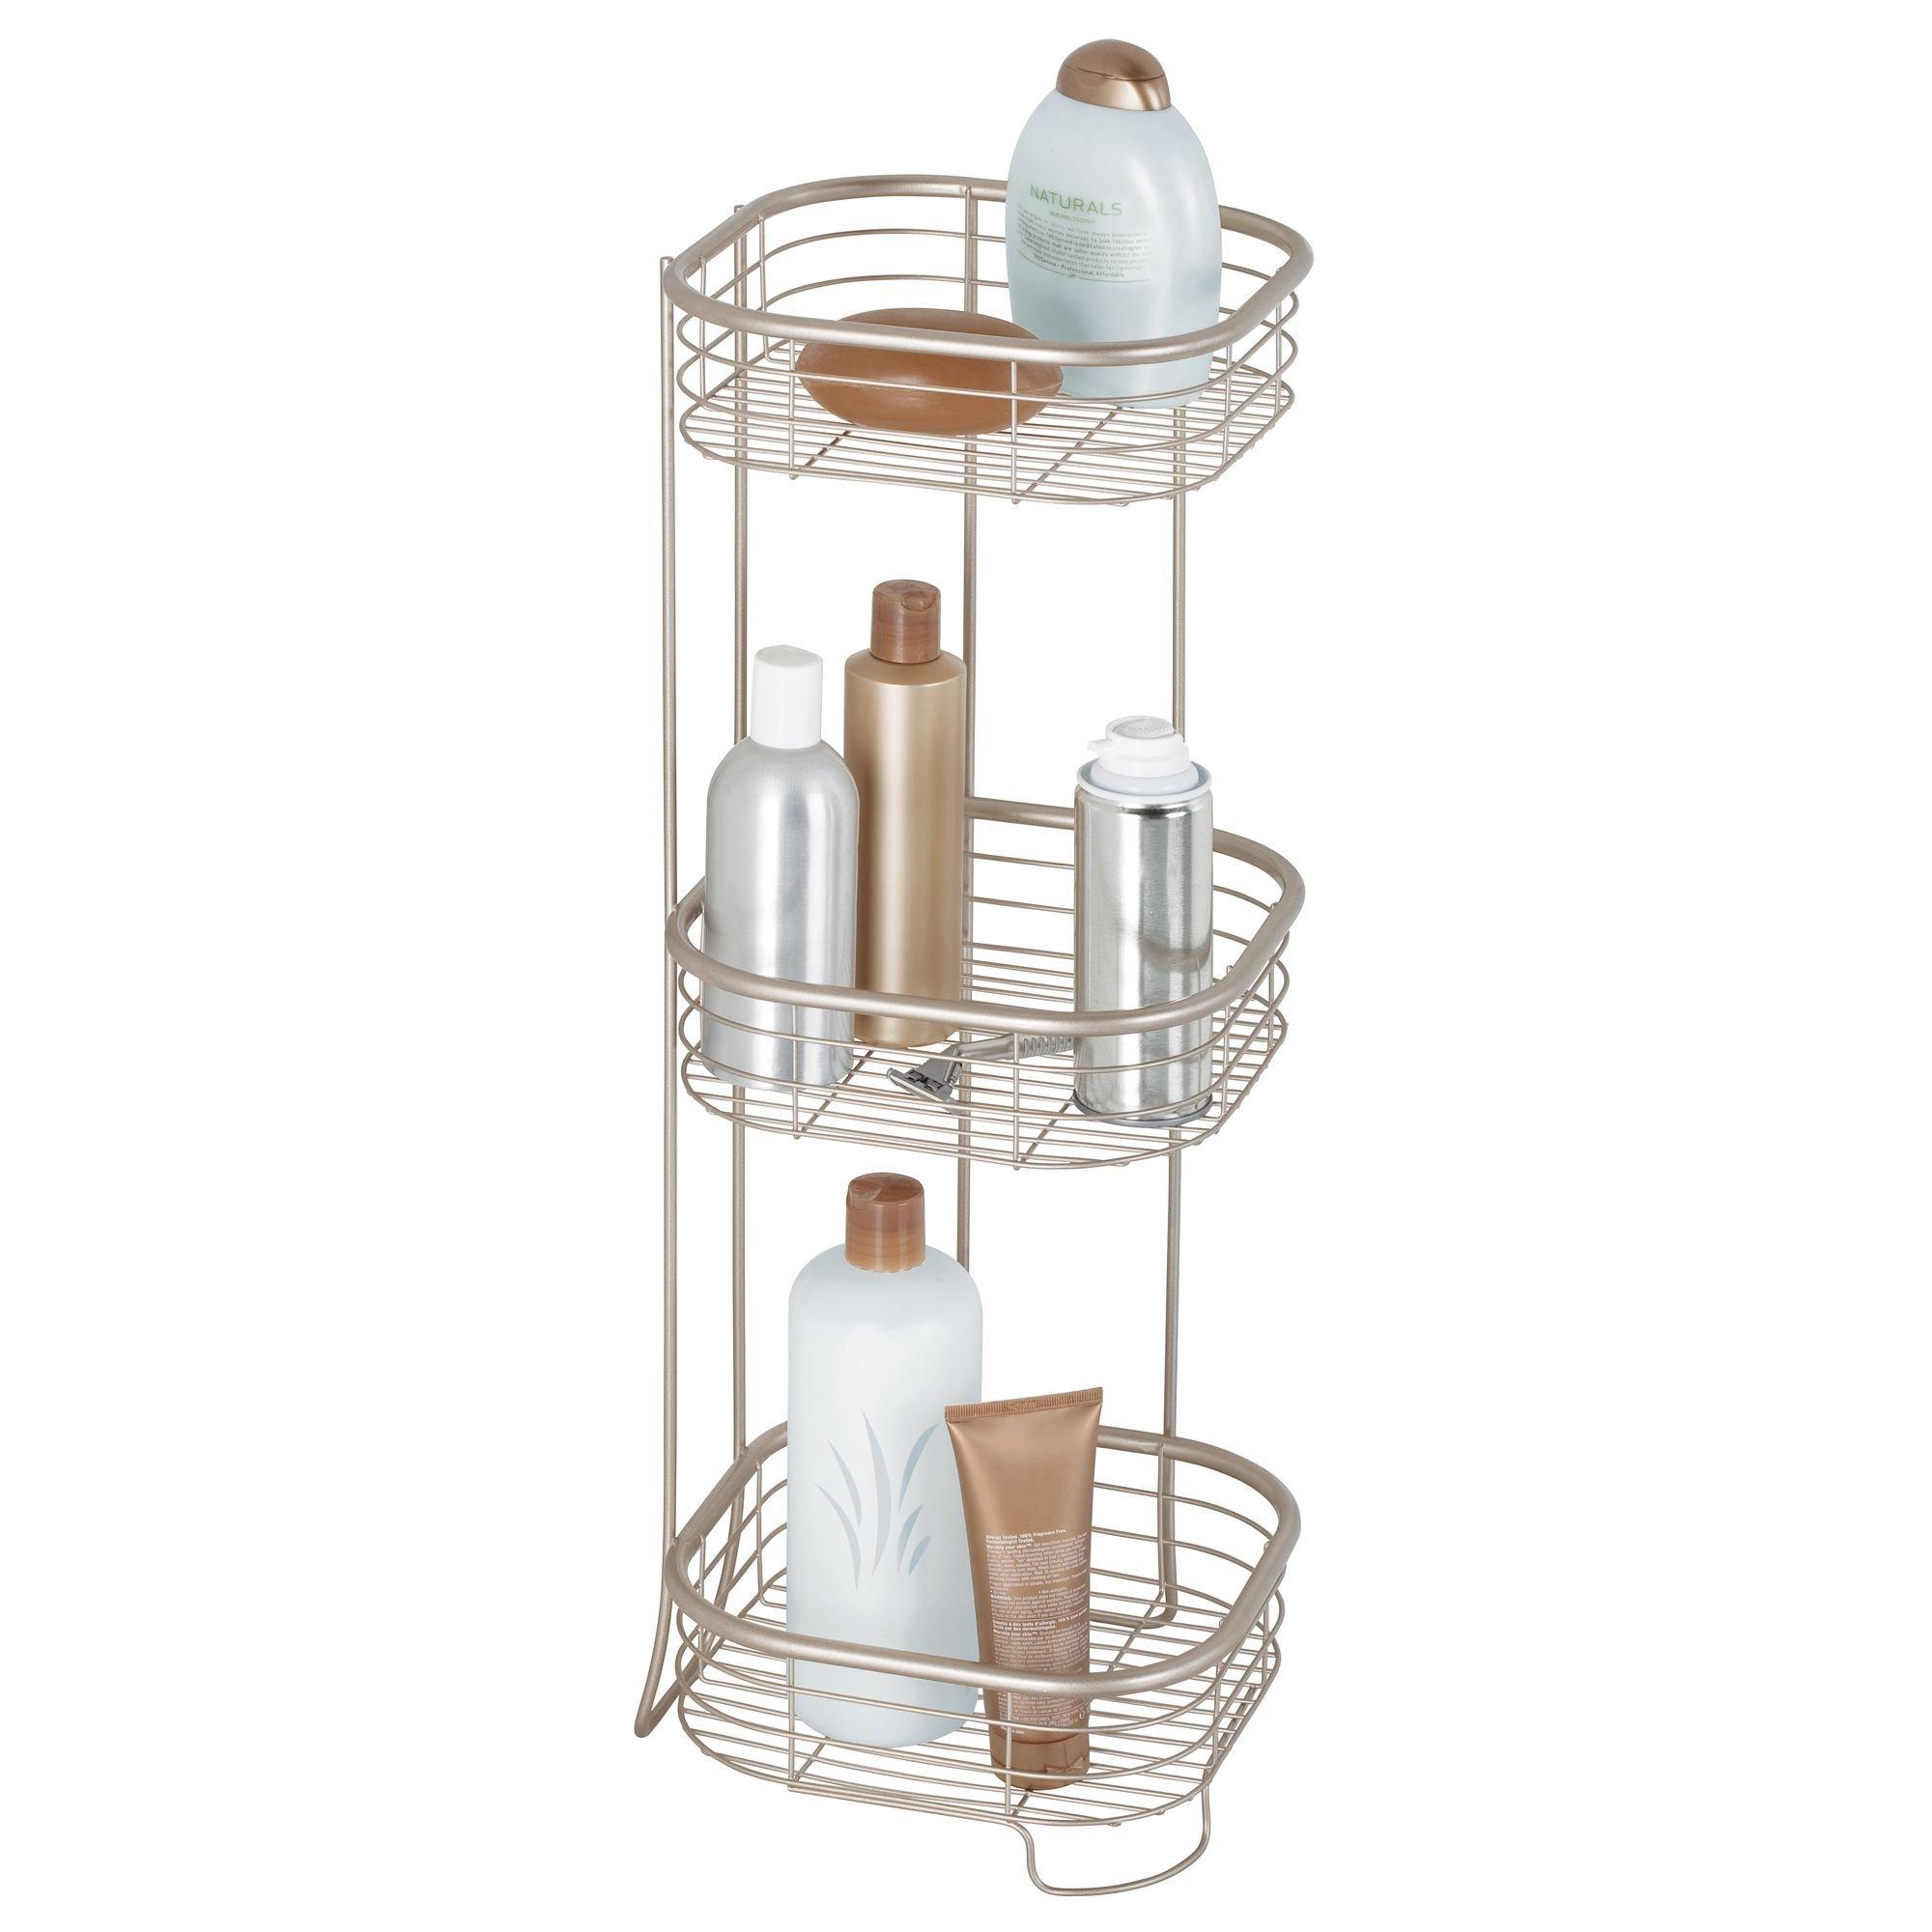 iDesign Forma Metal Wire Corner Standing Shower Caddy, Bath Shelf Baskets for Shampoo, Conditioner, Soap, 9.5'' x 9.5'' x 26.25'', Satin